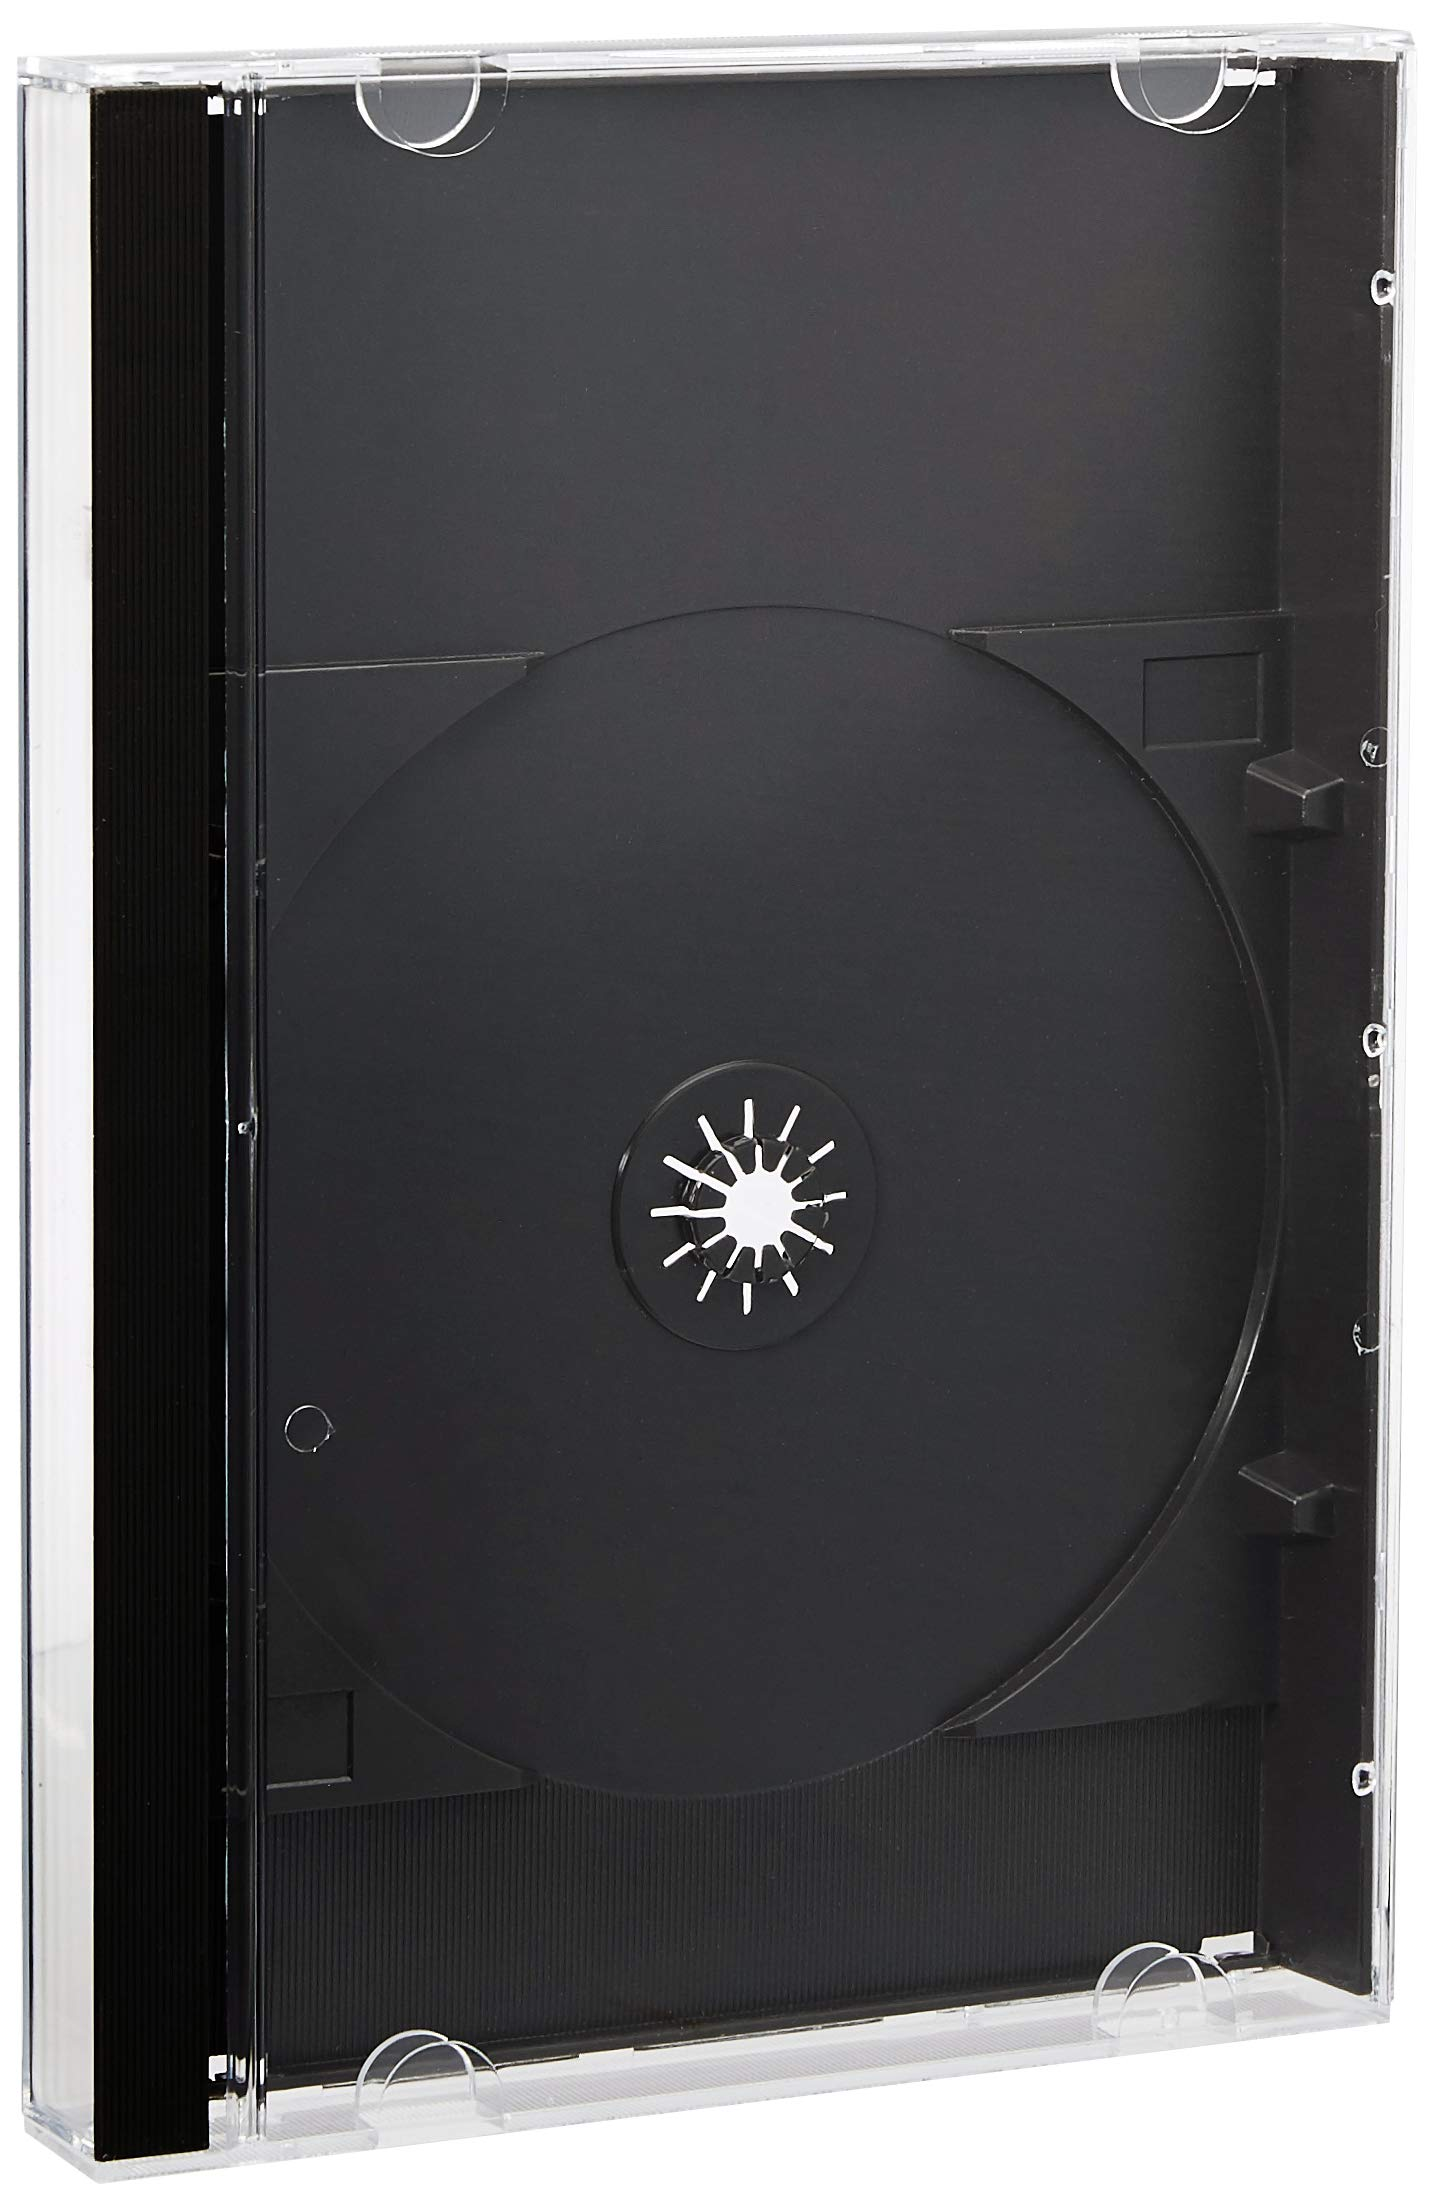 Sega CD / Sega Saturn replacement game cases 10 pack **SECOND RUN** by VGC online (Image #2)